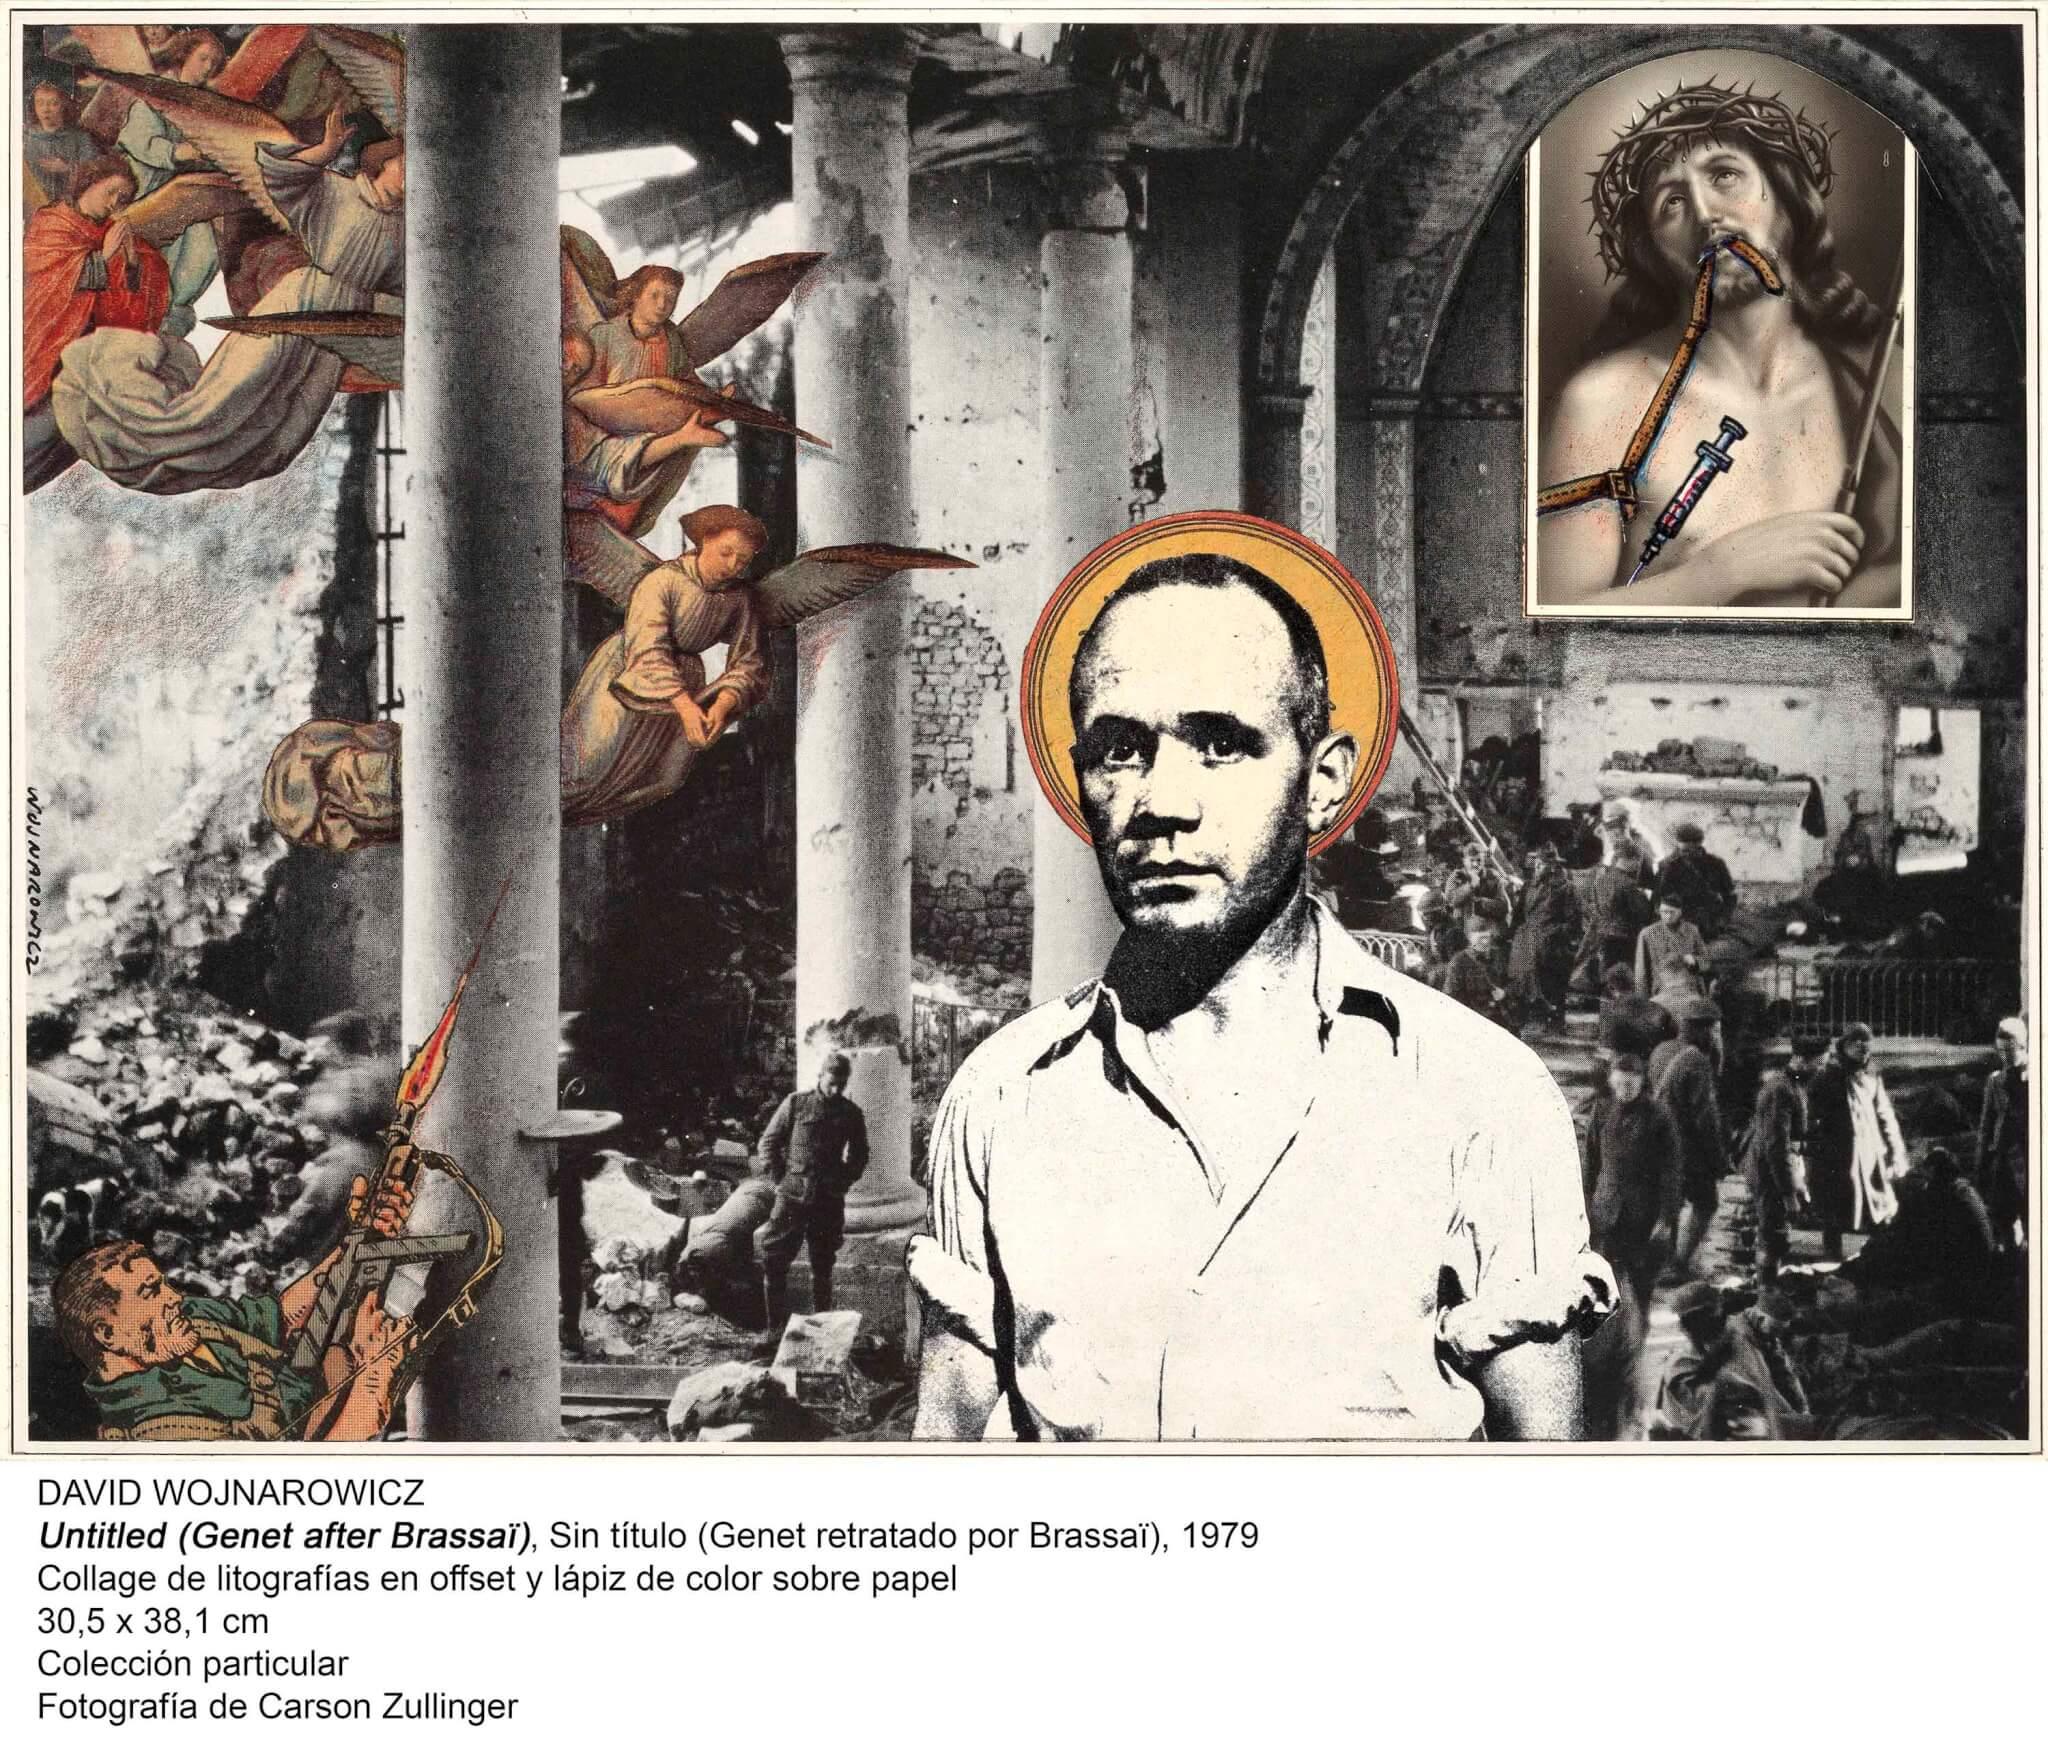 collage de David Wojnarowicz